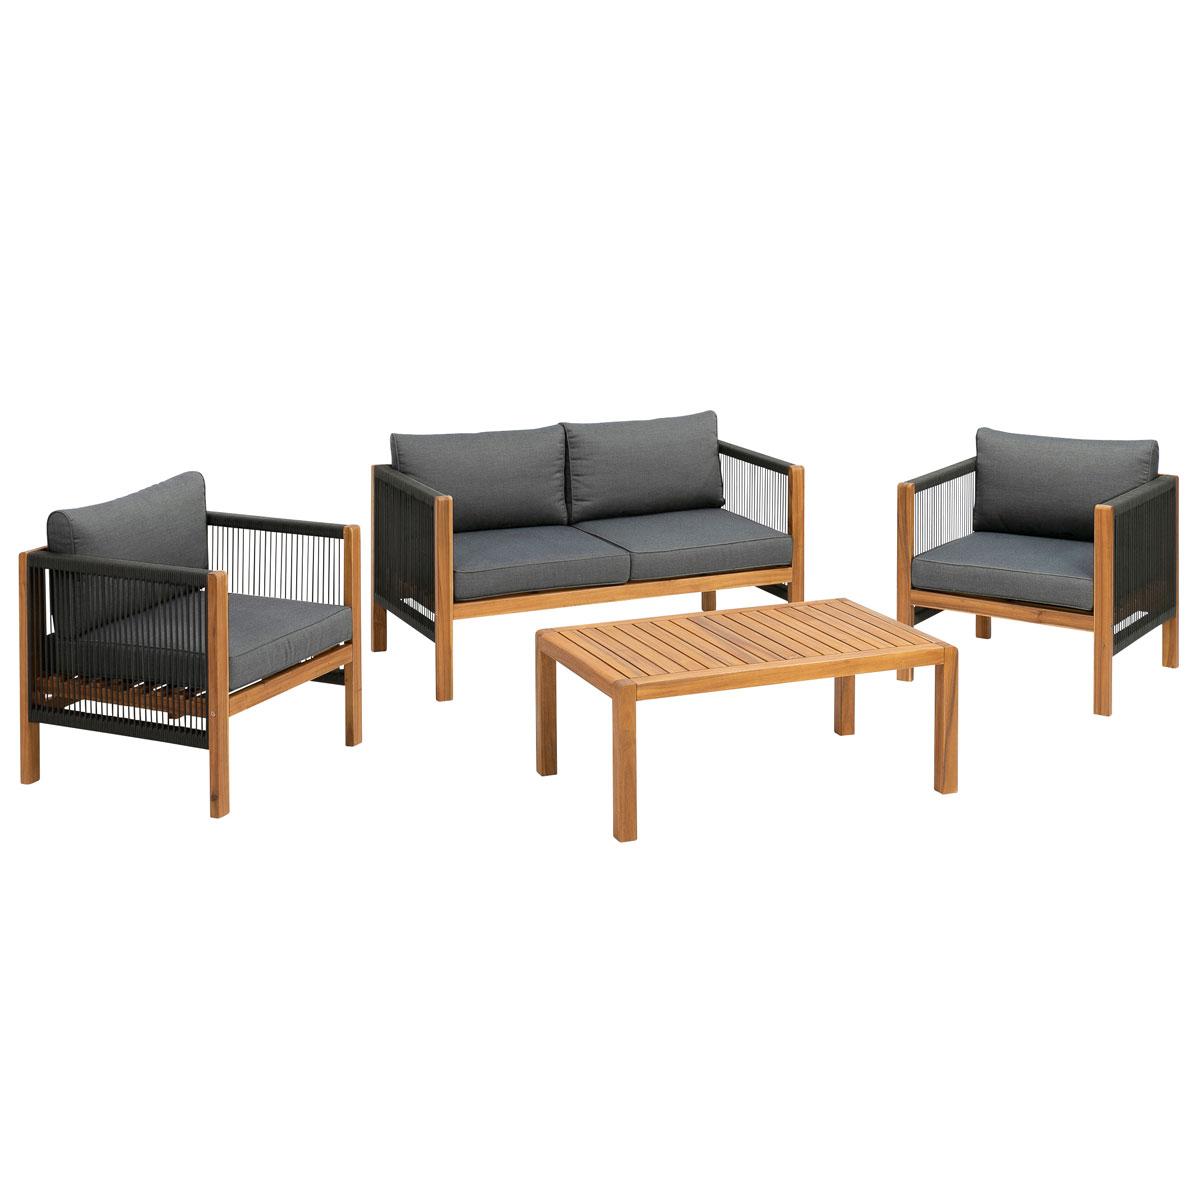 Loungemöbel - Kaffee Set  - Onlineshop Hellweg